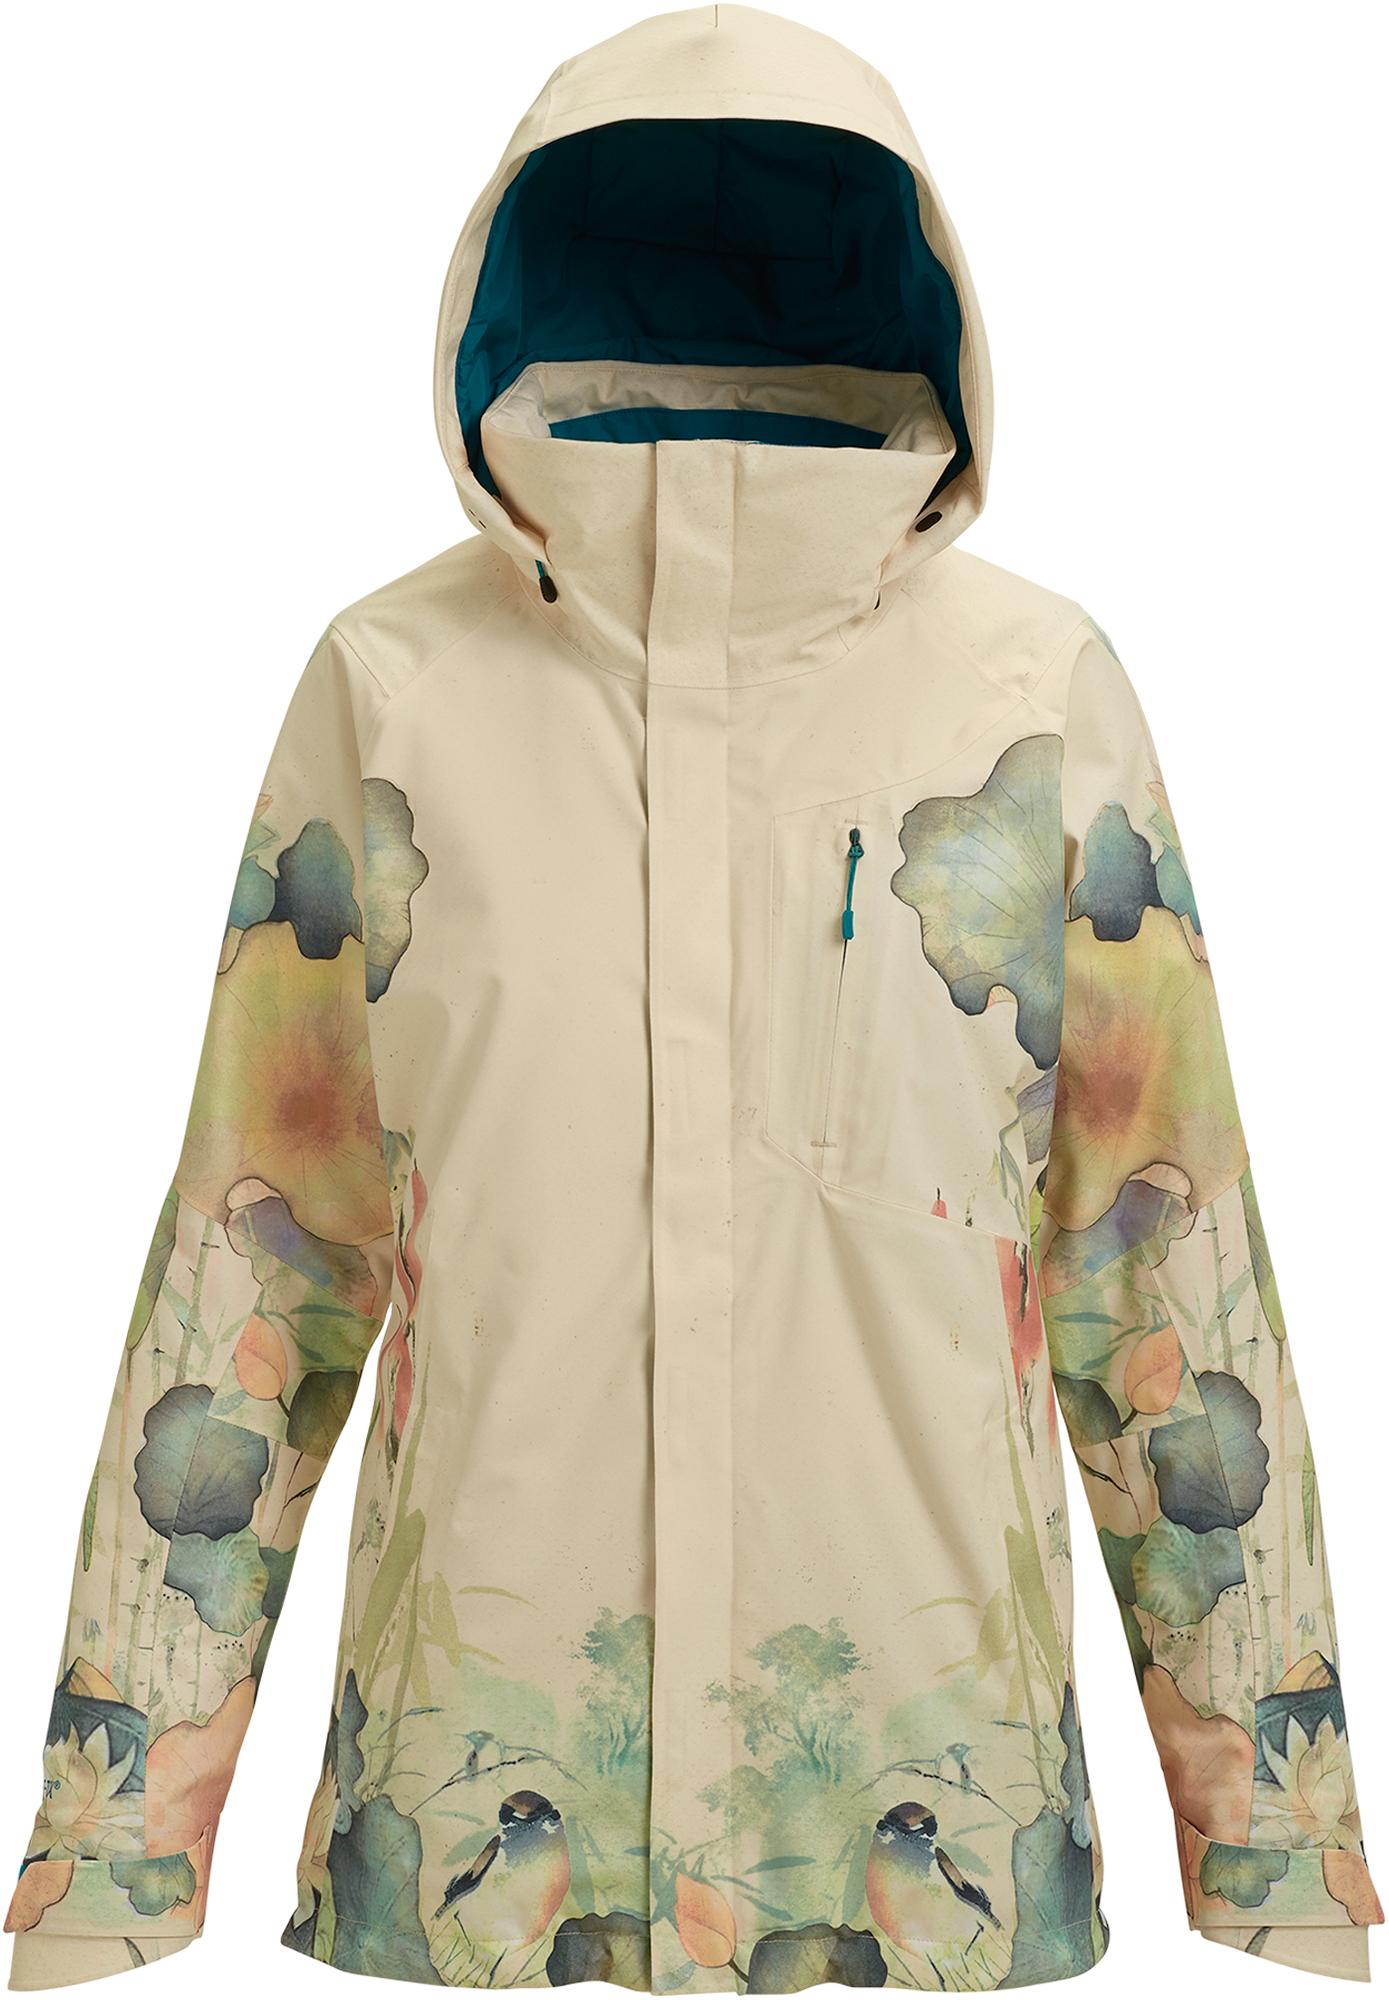 Burton Куртка утепленная женская Burton Ak Gore-Tex Embark, размер 44-46 burton куртка утепленная женская burton minturn размер 48 50